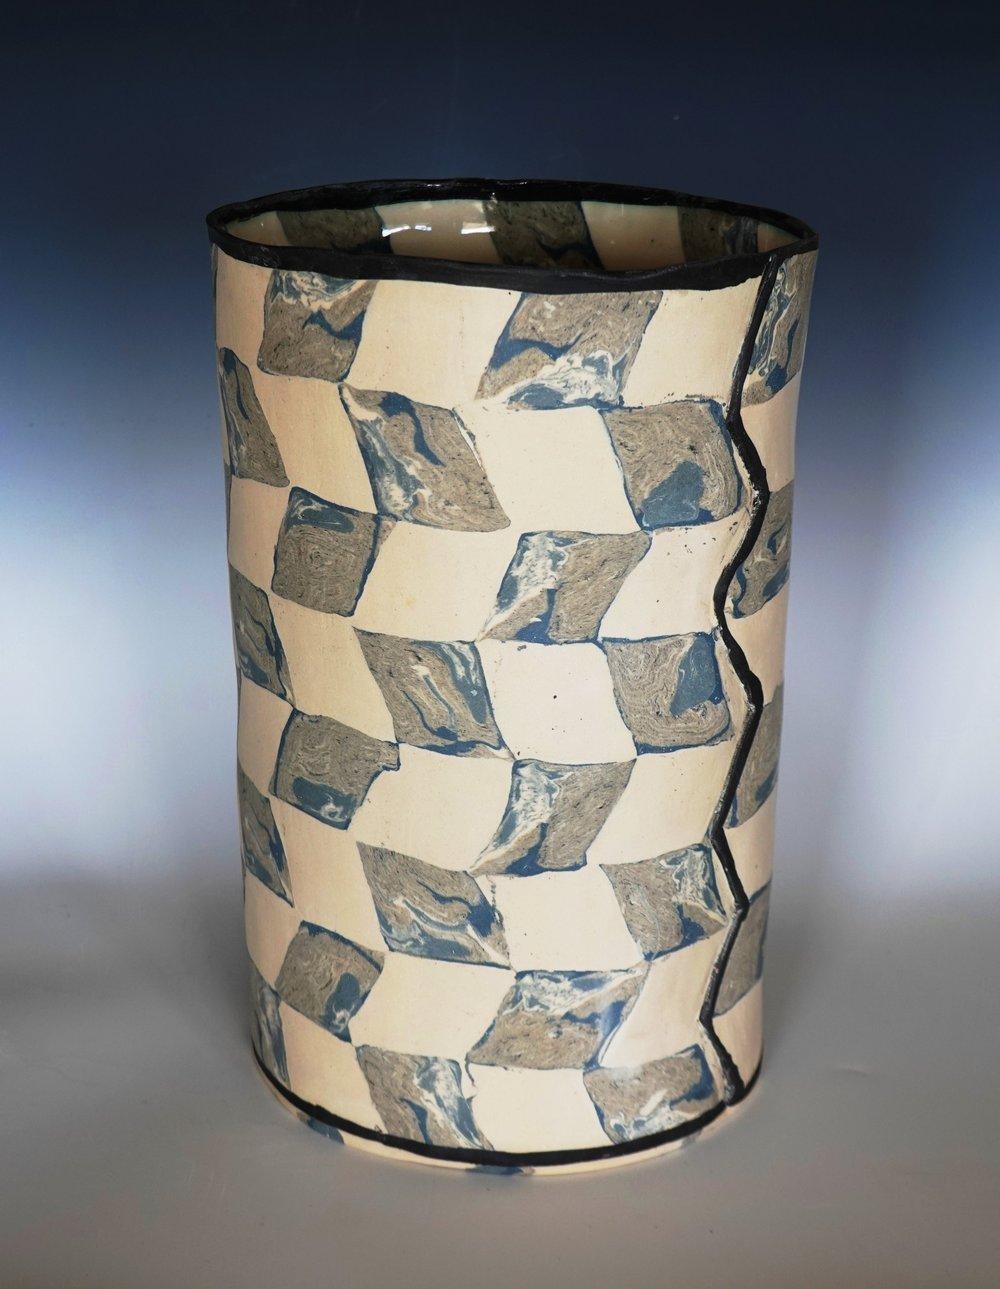 rosenberg.jessica.2019.Medium cylinder with marbled and white  rhombus.JPG